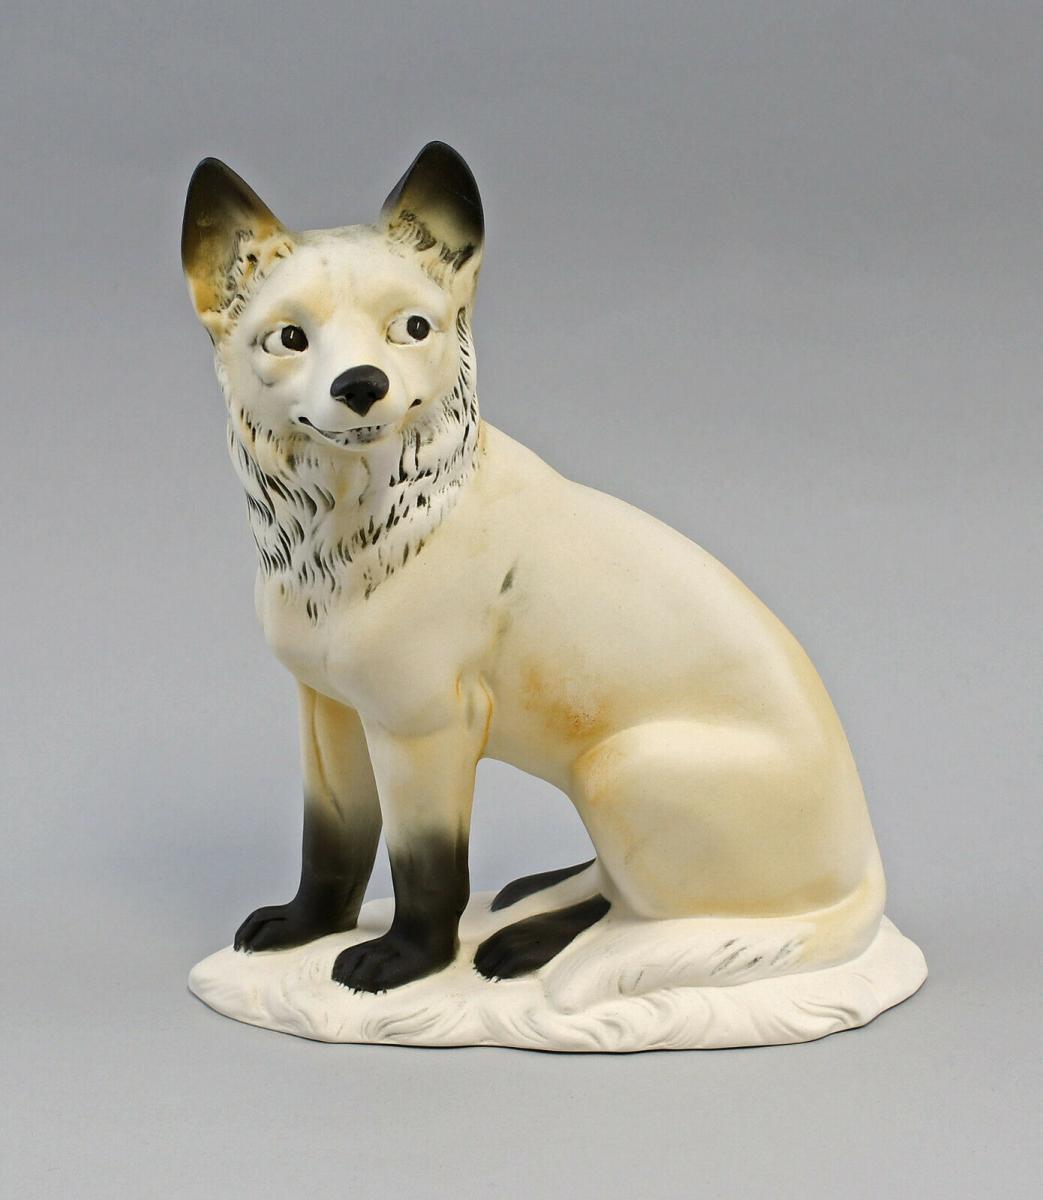 9959477 Porzellan Figur Polar- Fuchs bisquit Ens 17,5x9x21,5cm